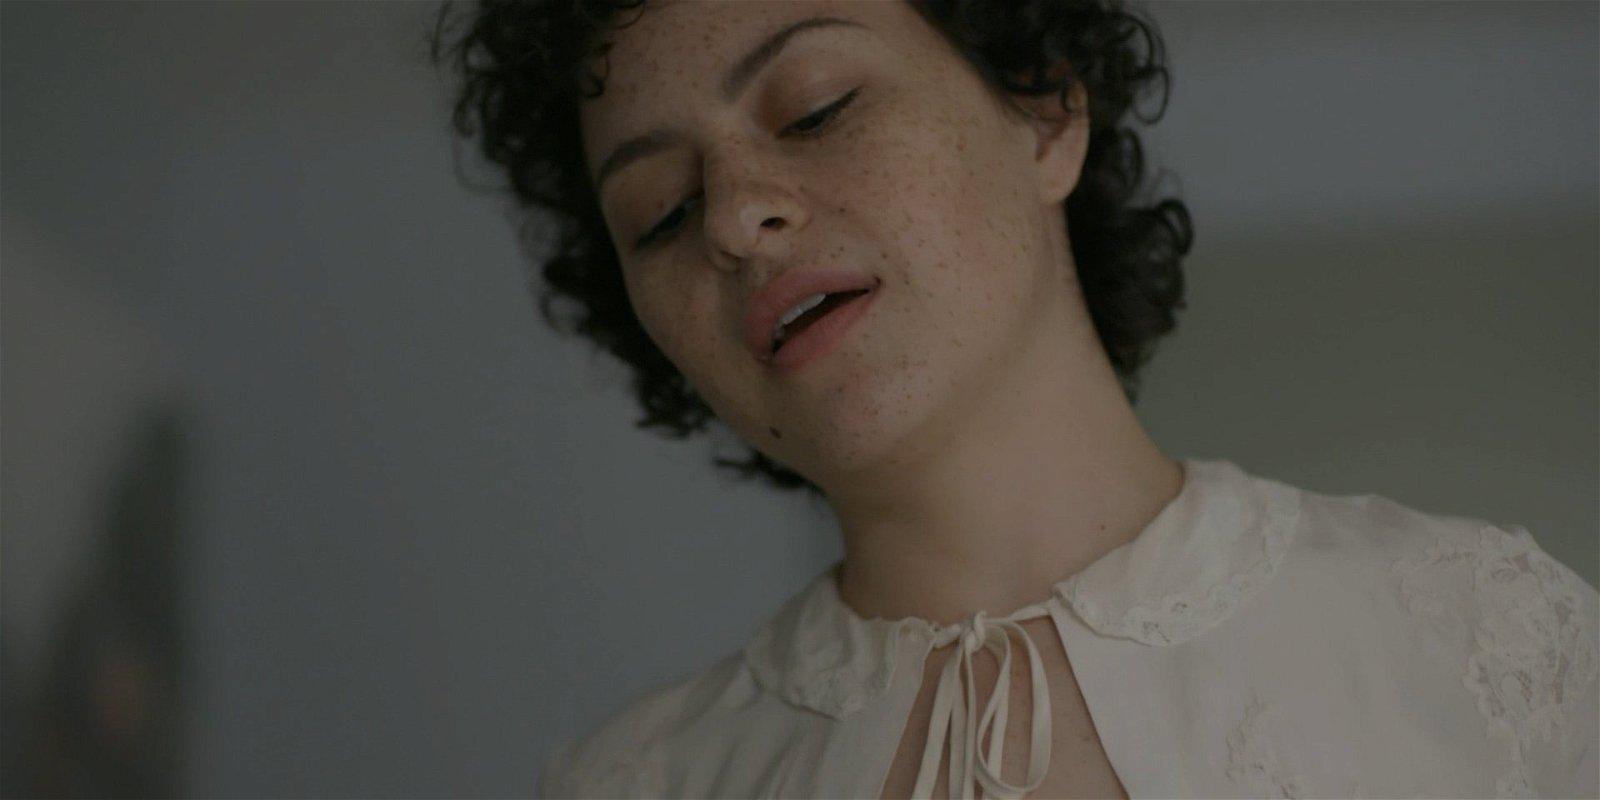 Alia Shawkat boobs show